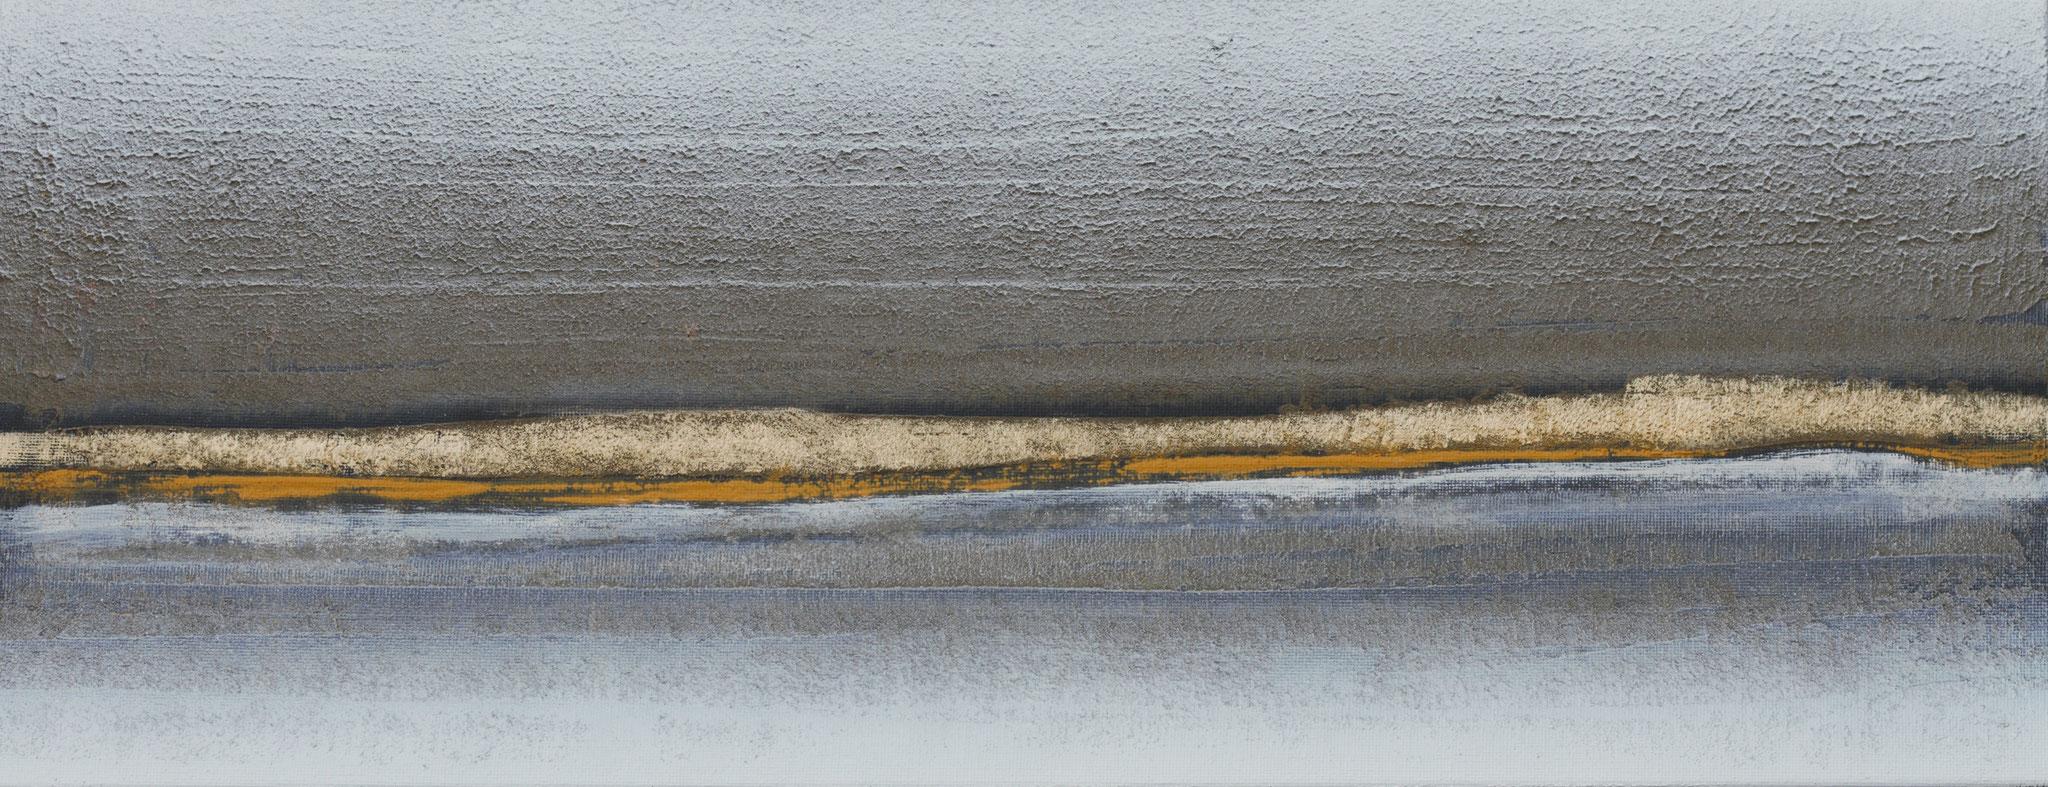 No. 139 Mischtechnik Acryl auf Leinwand 20x50x4 cm (2018)